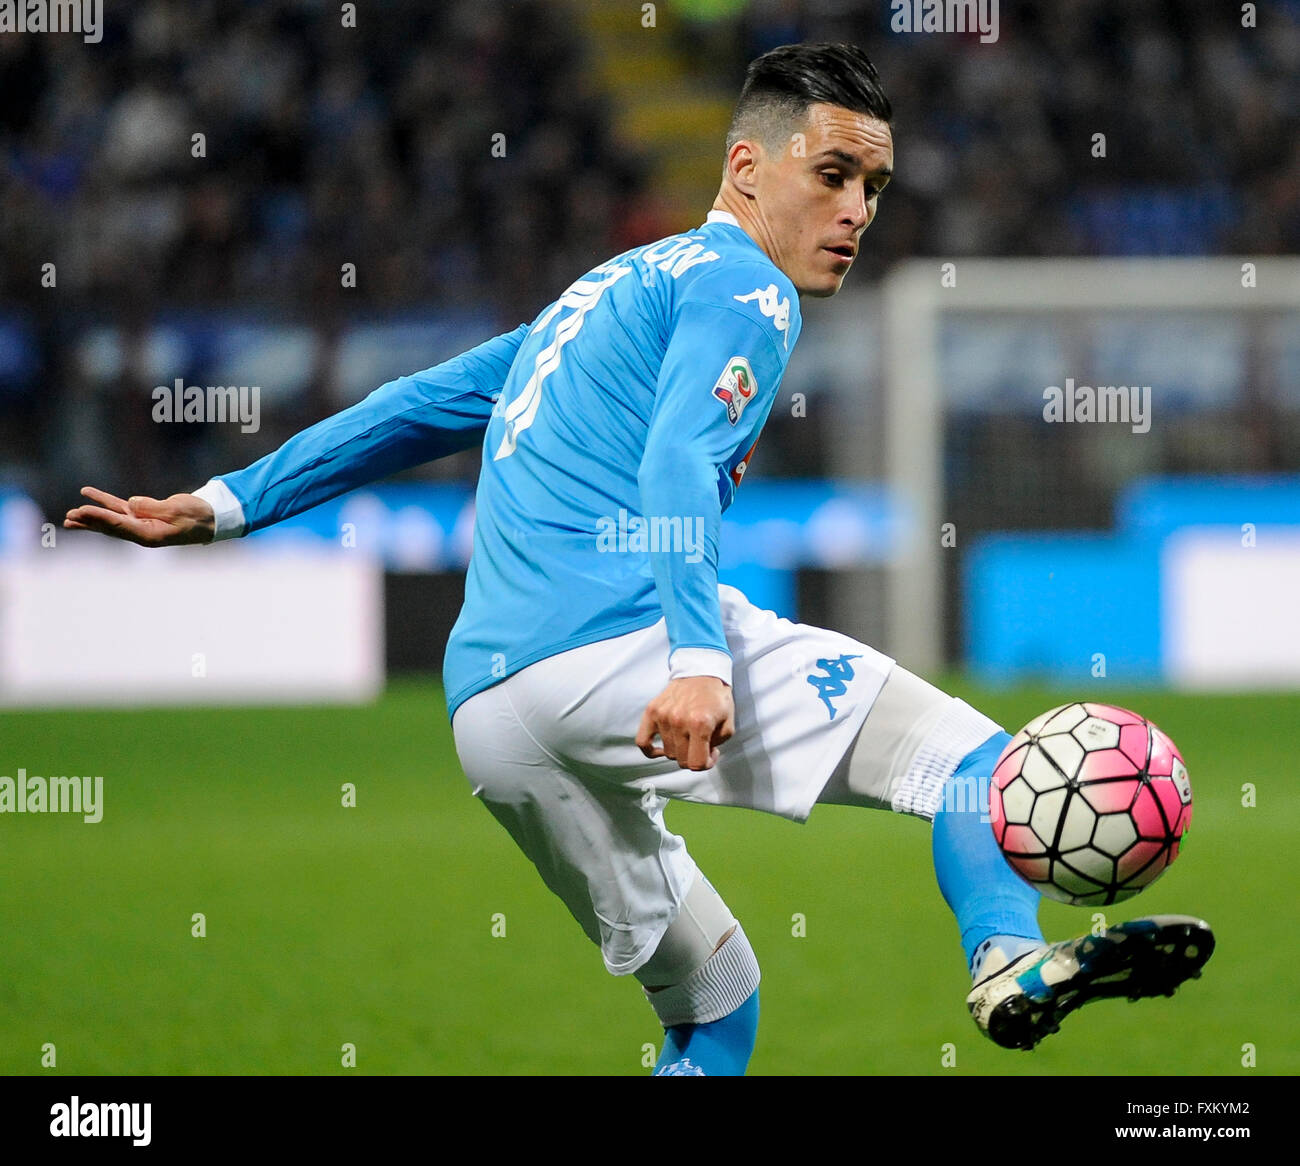 Milan Italy 16 April 2016 Jose Maria Callejon in action during